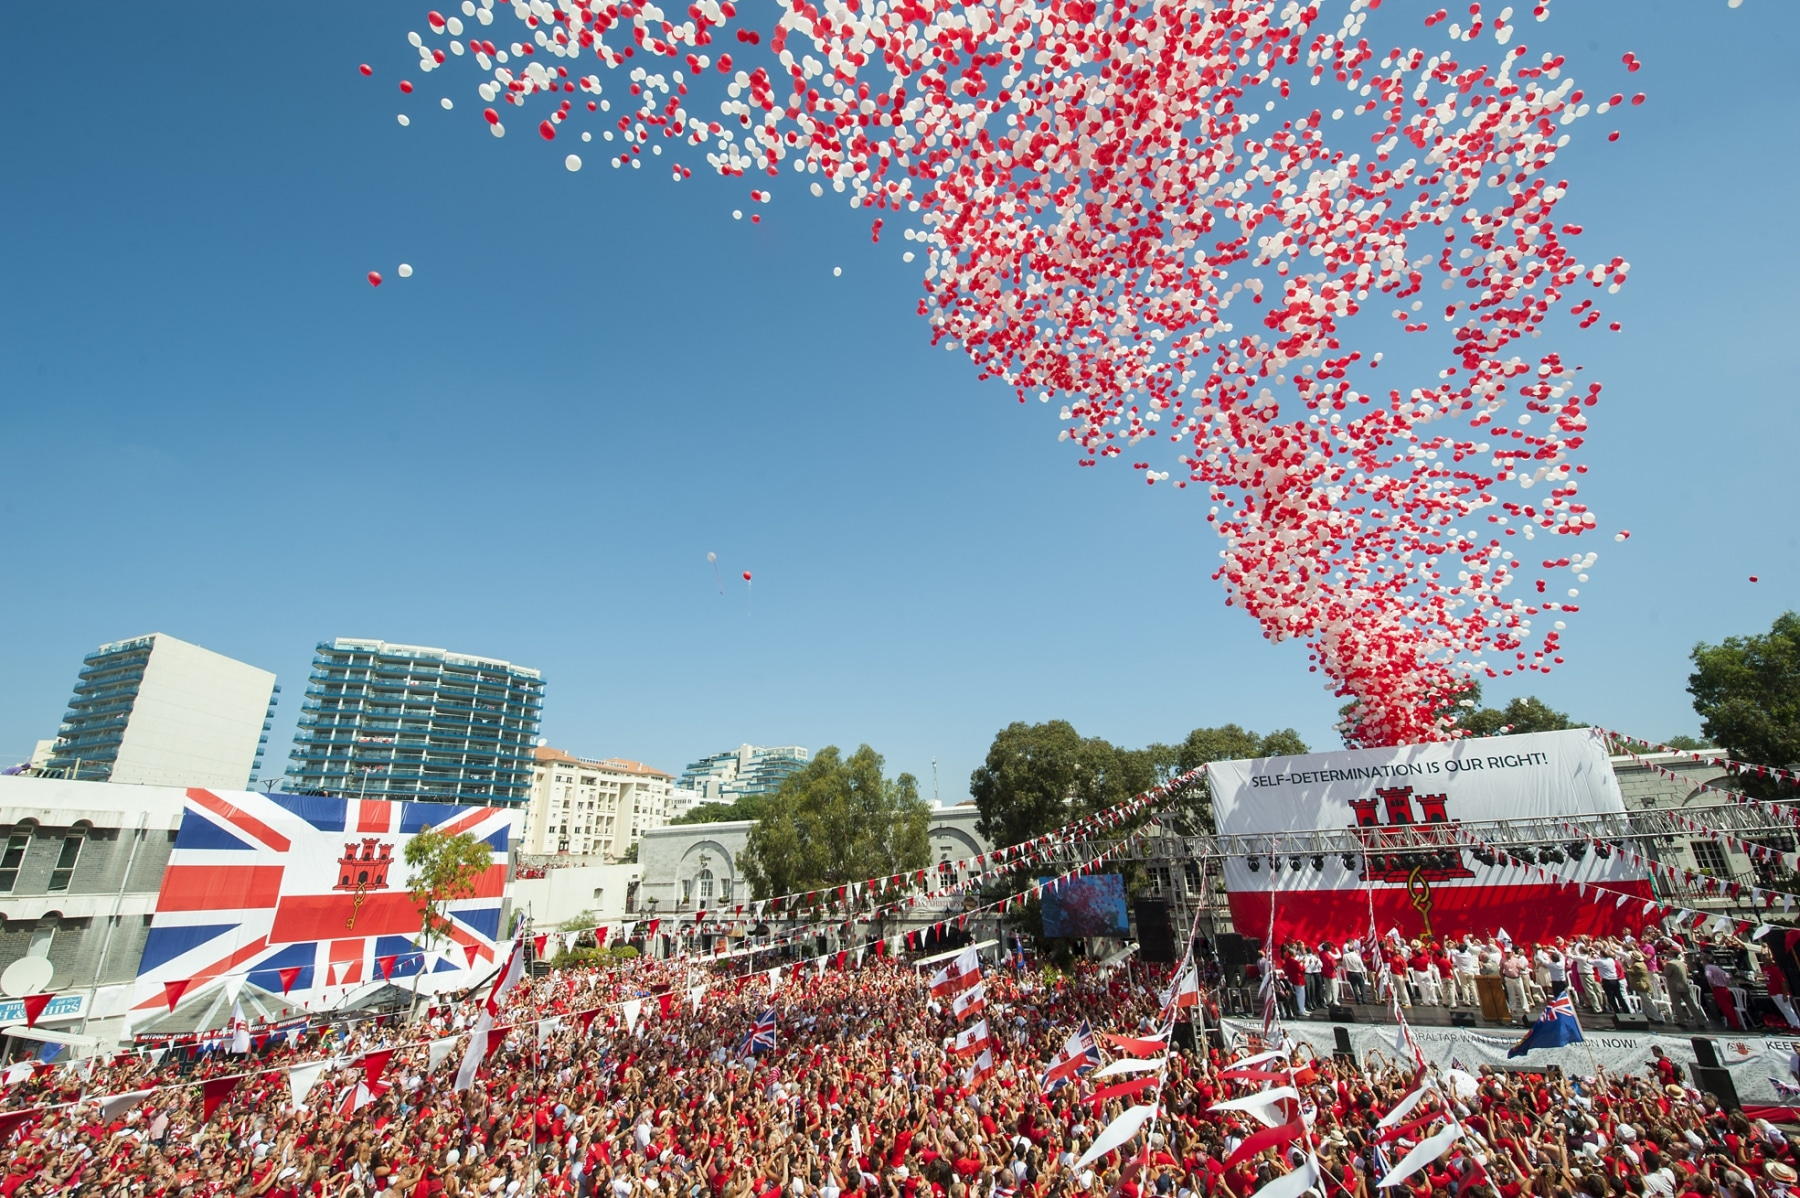 gibraltar-national-day_026_9719744436_o